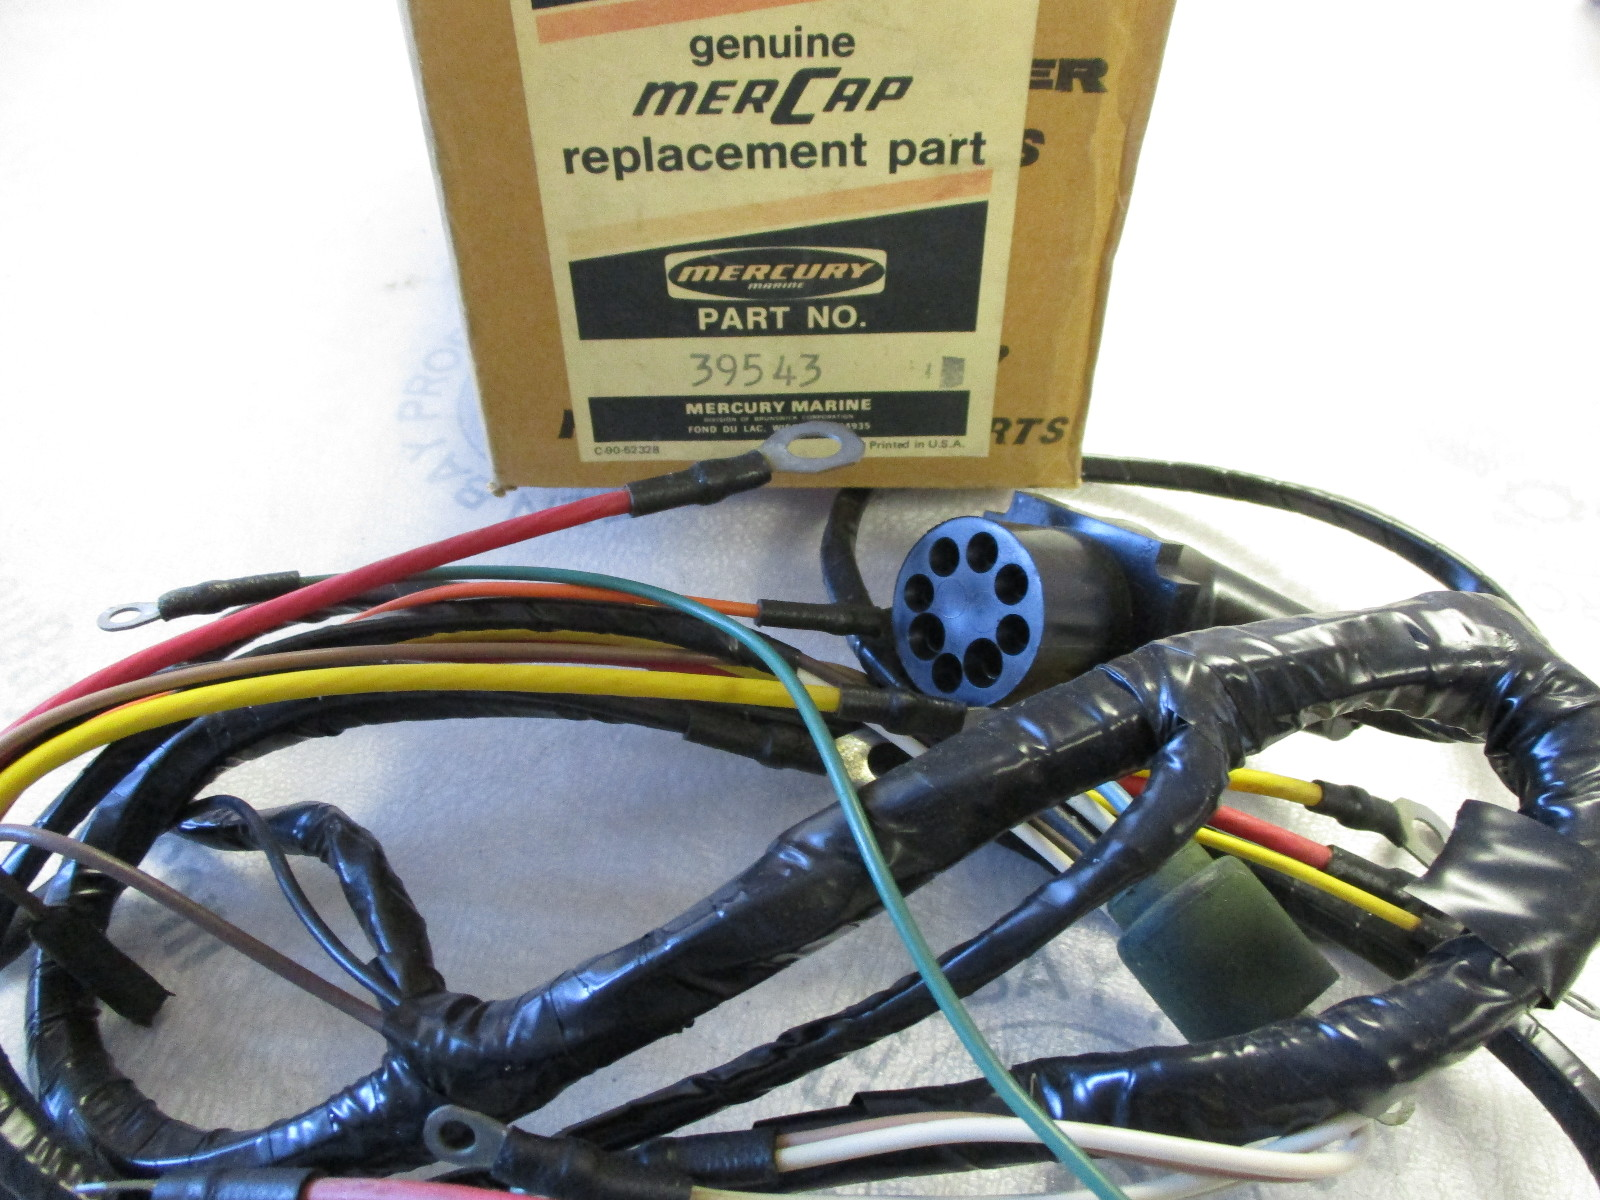 39543 Mercury MerCap Mercruiser Stern Drive Engine Wire Harness 39543A1 ...